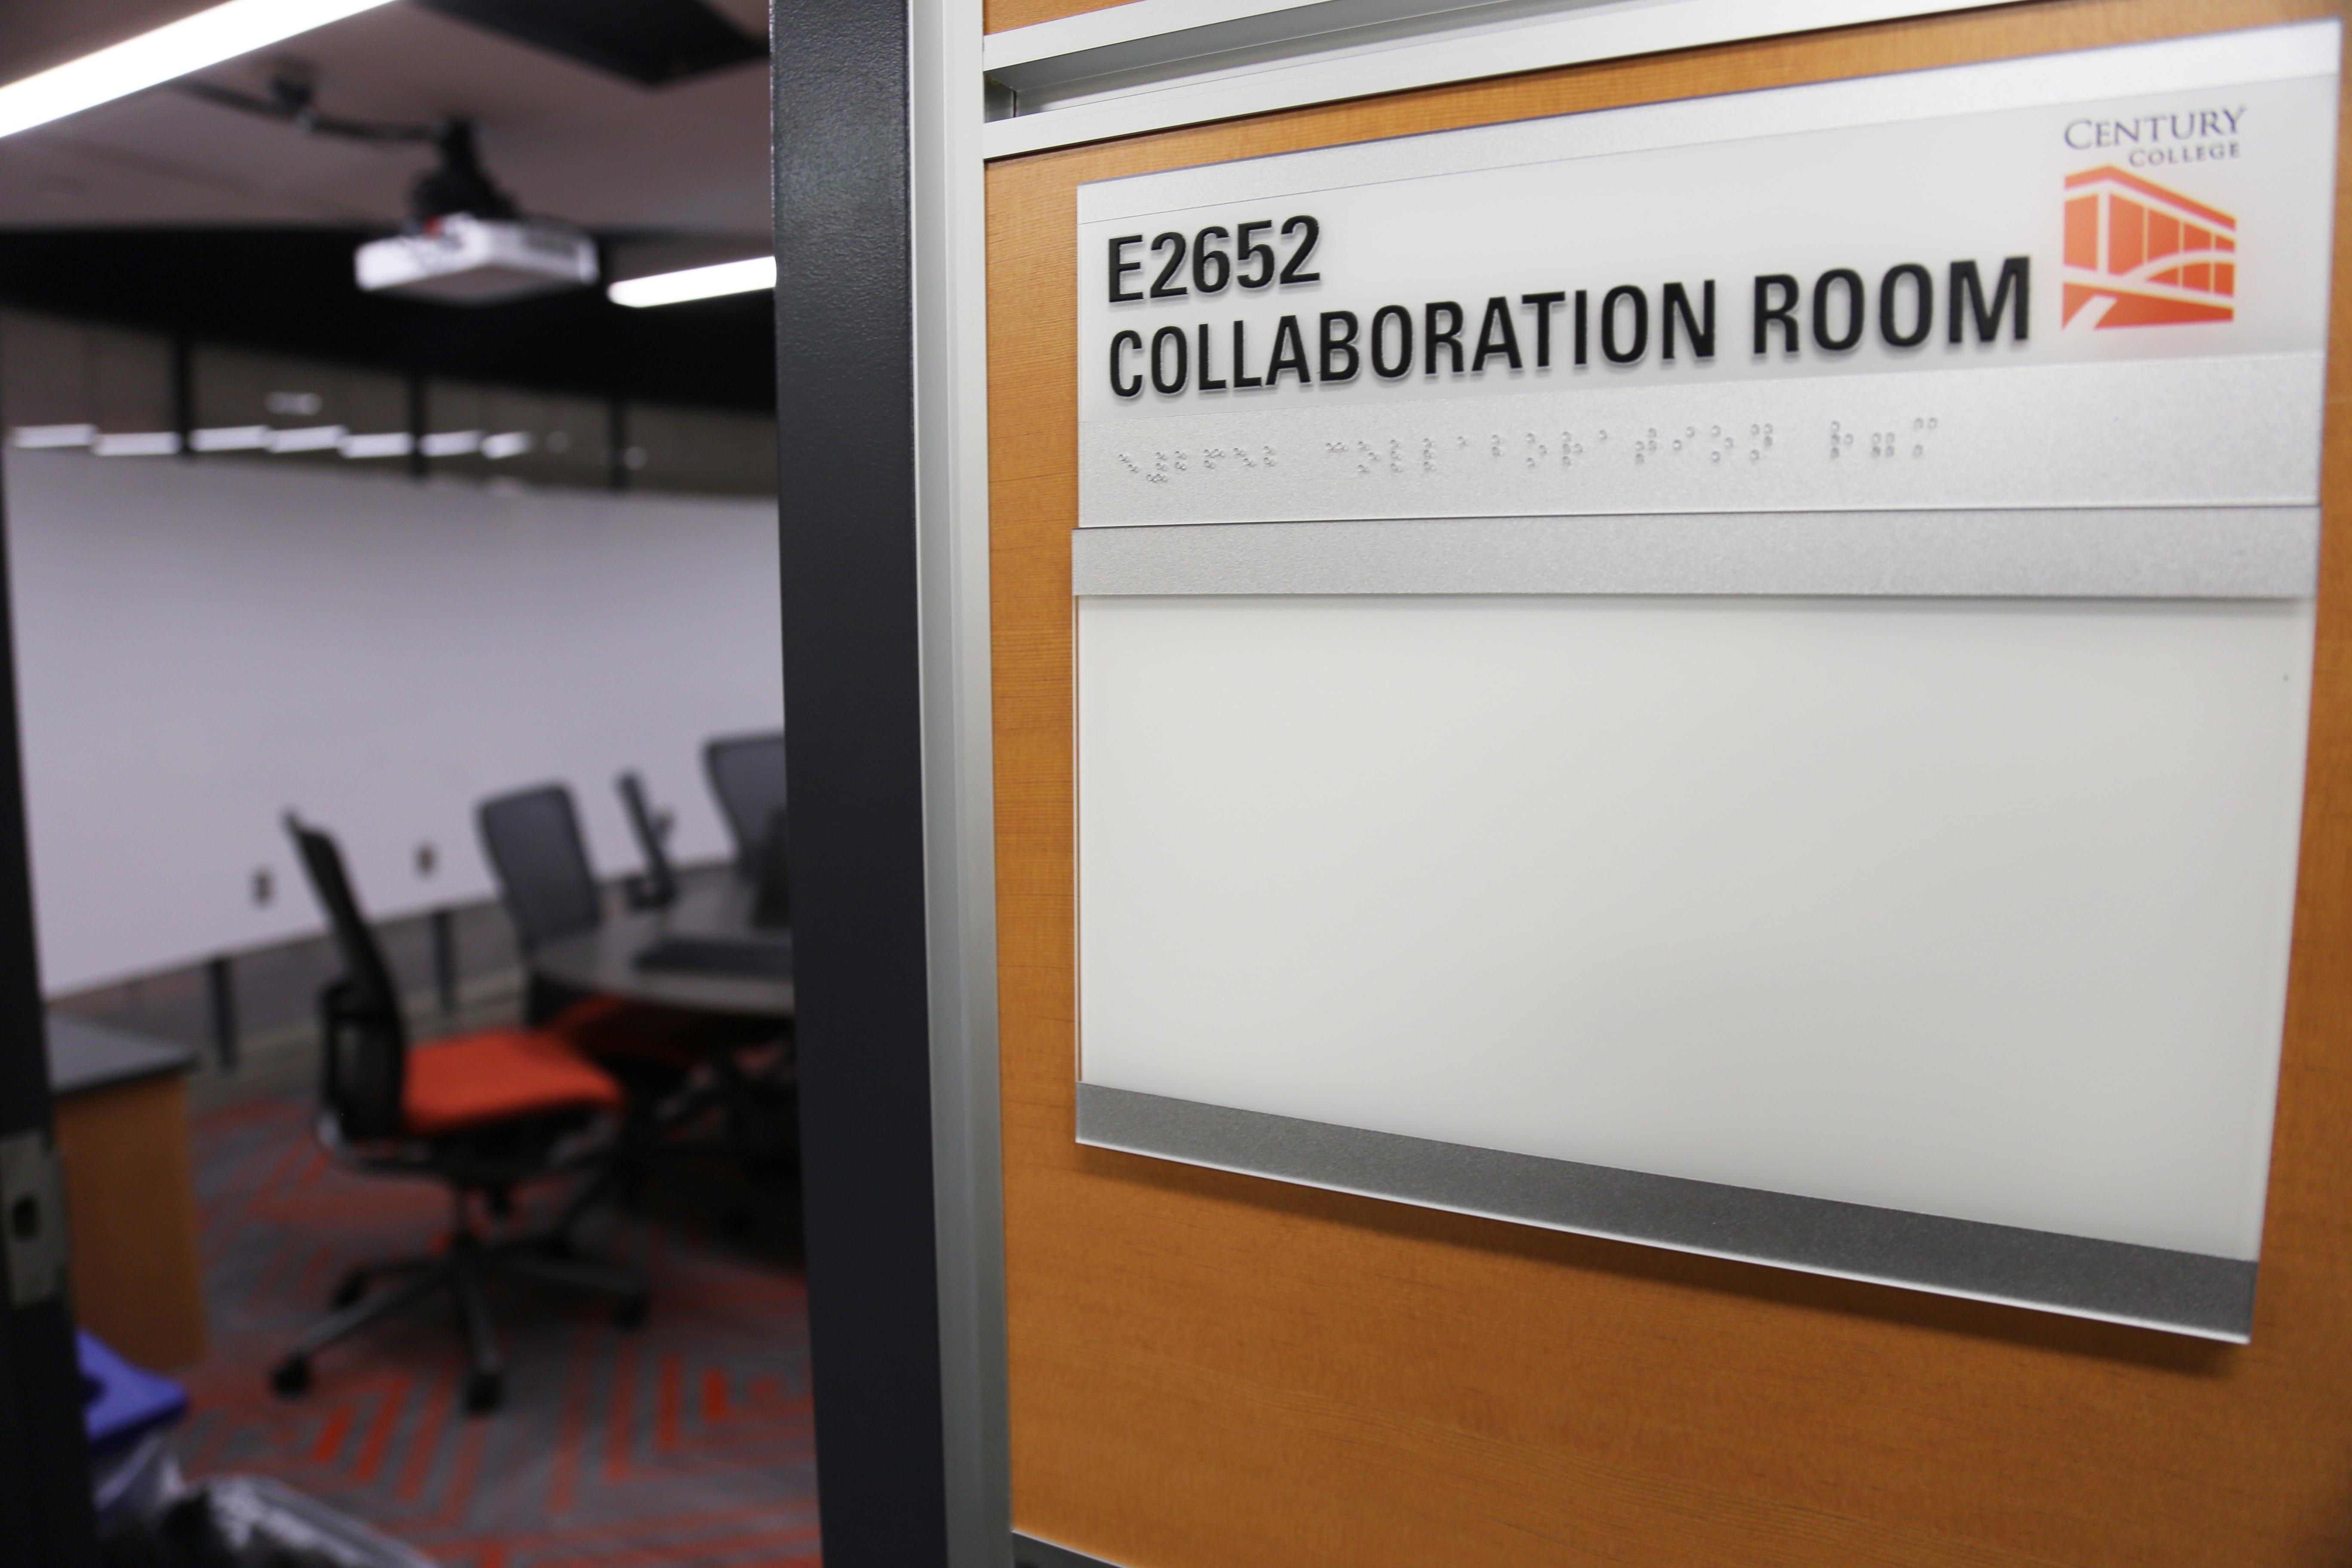 Image of Fab Lab collaboration room.